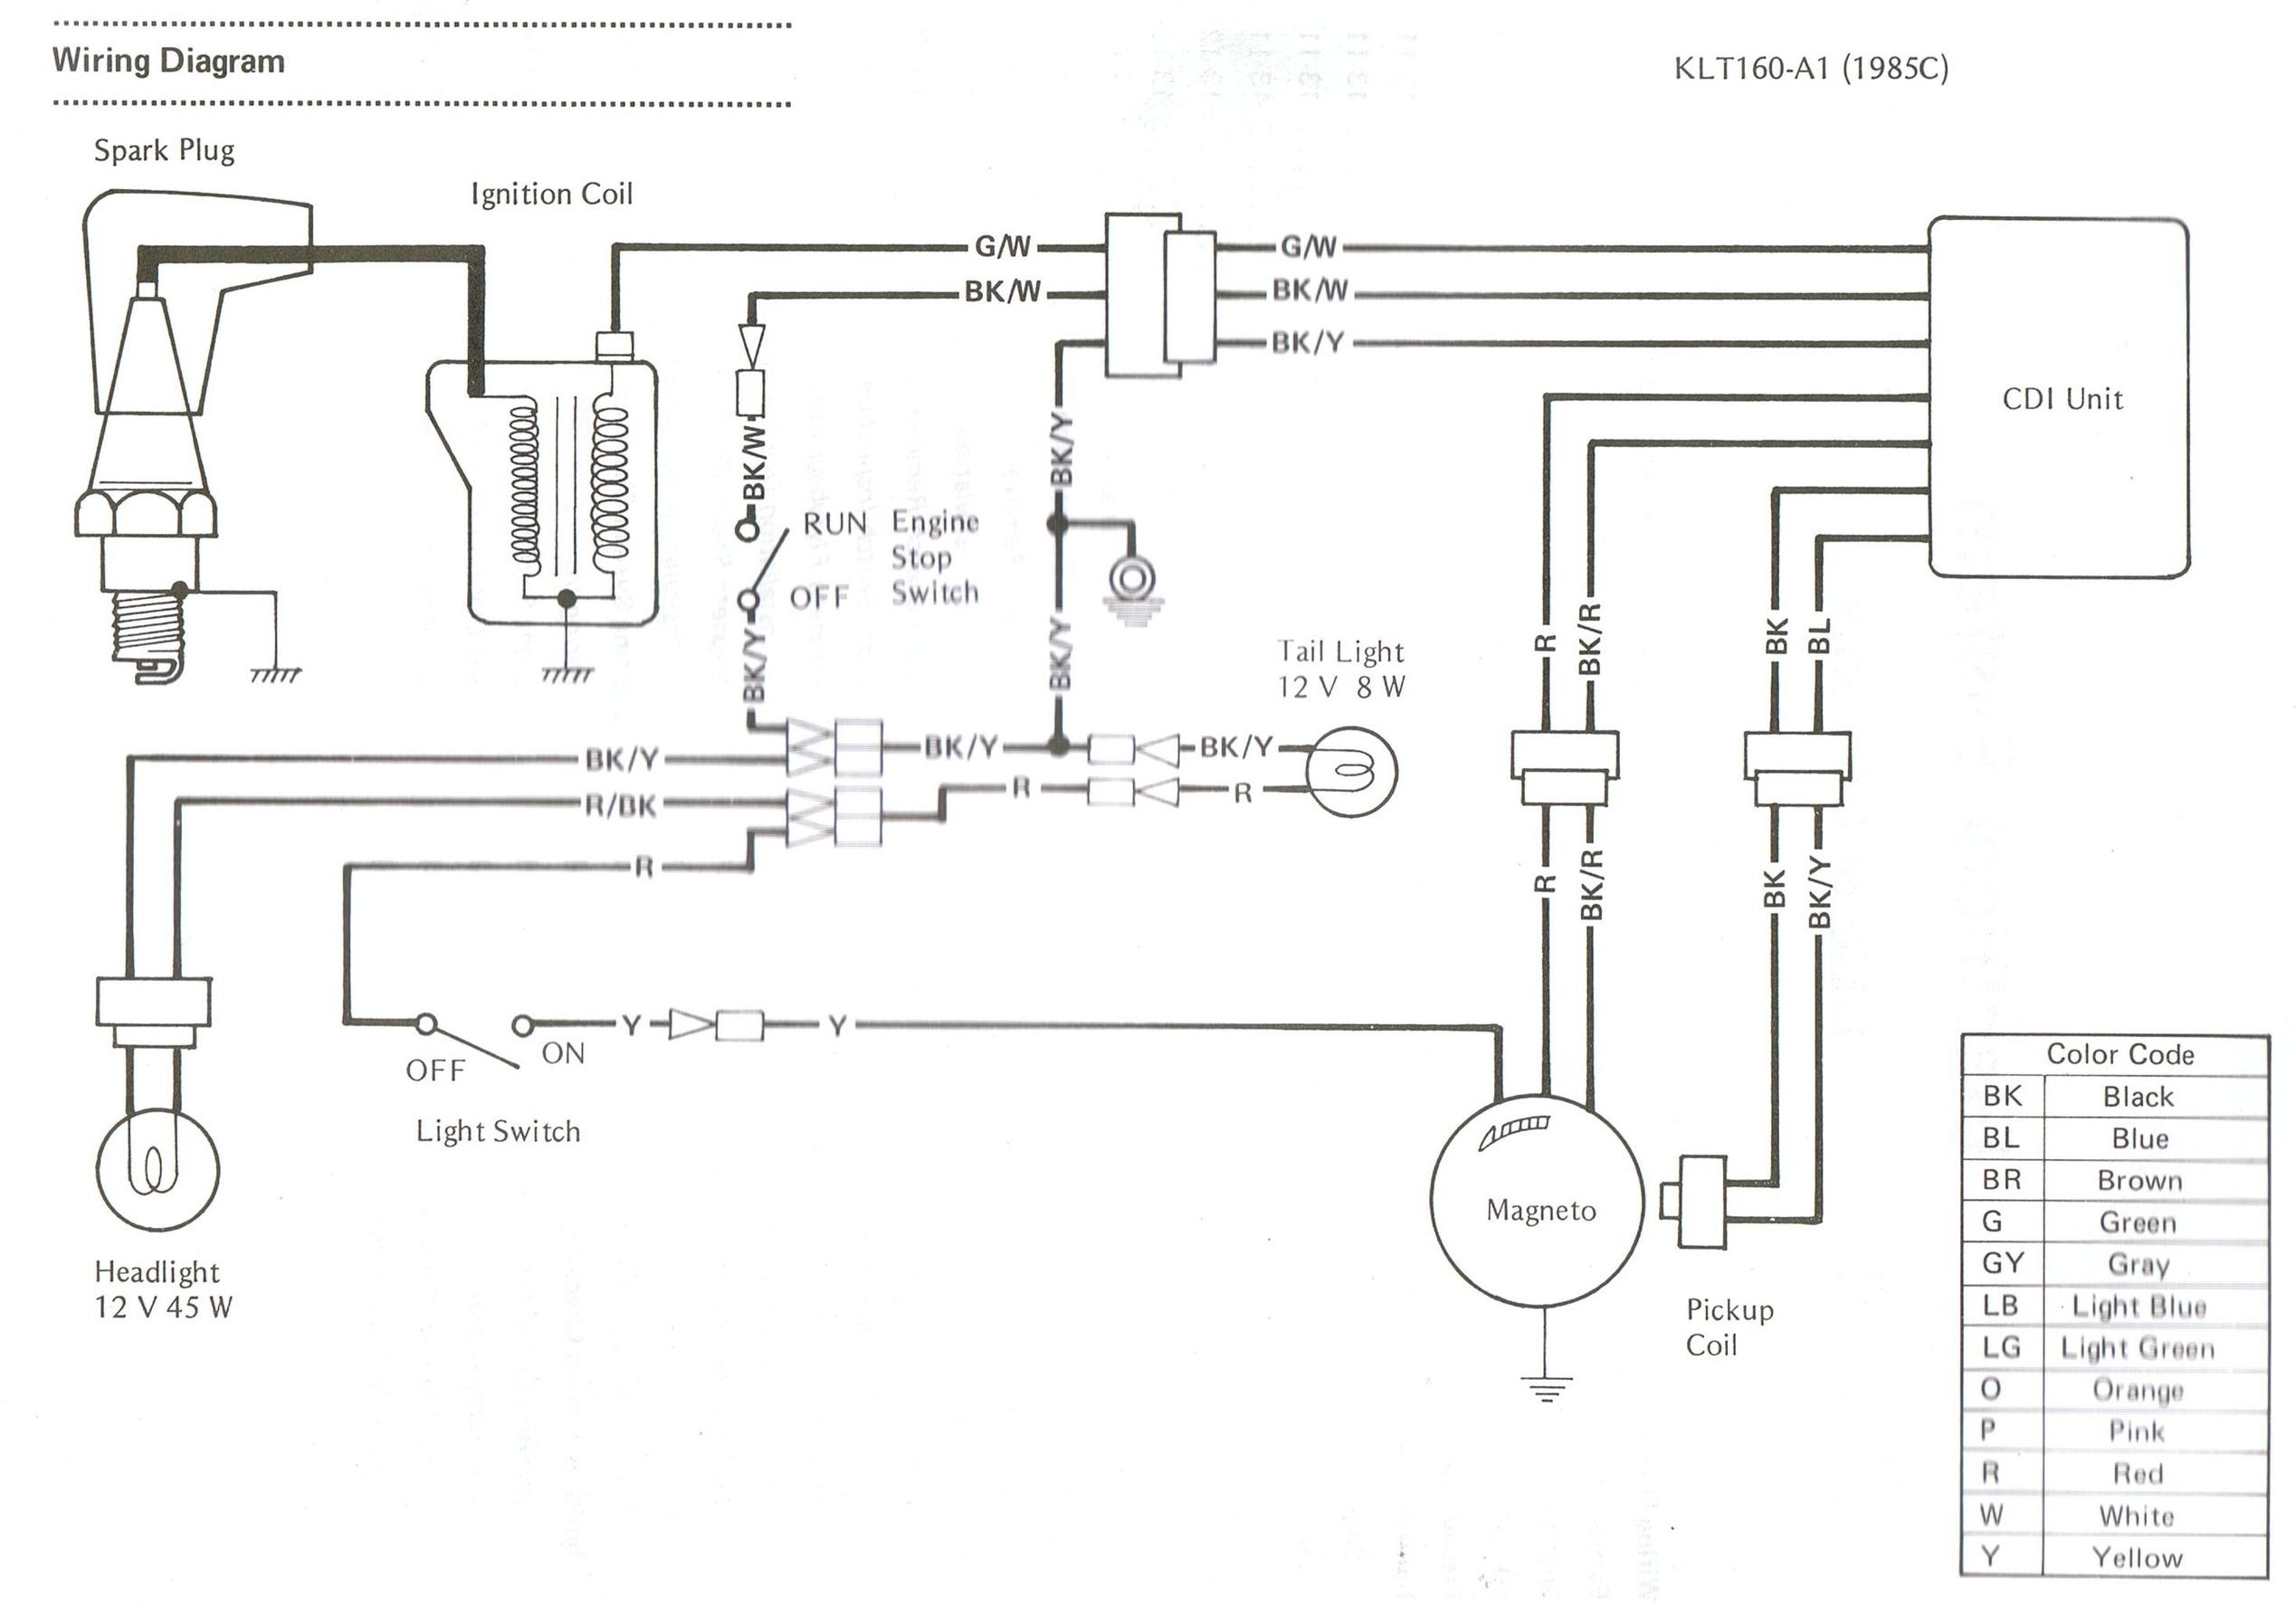 2000 polaris scrambler 50 wiring diagram library of wiring diagrams u2022  rh sv ti com polaris